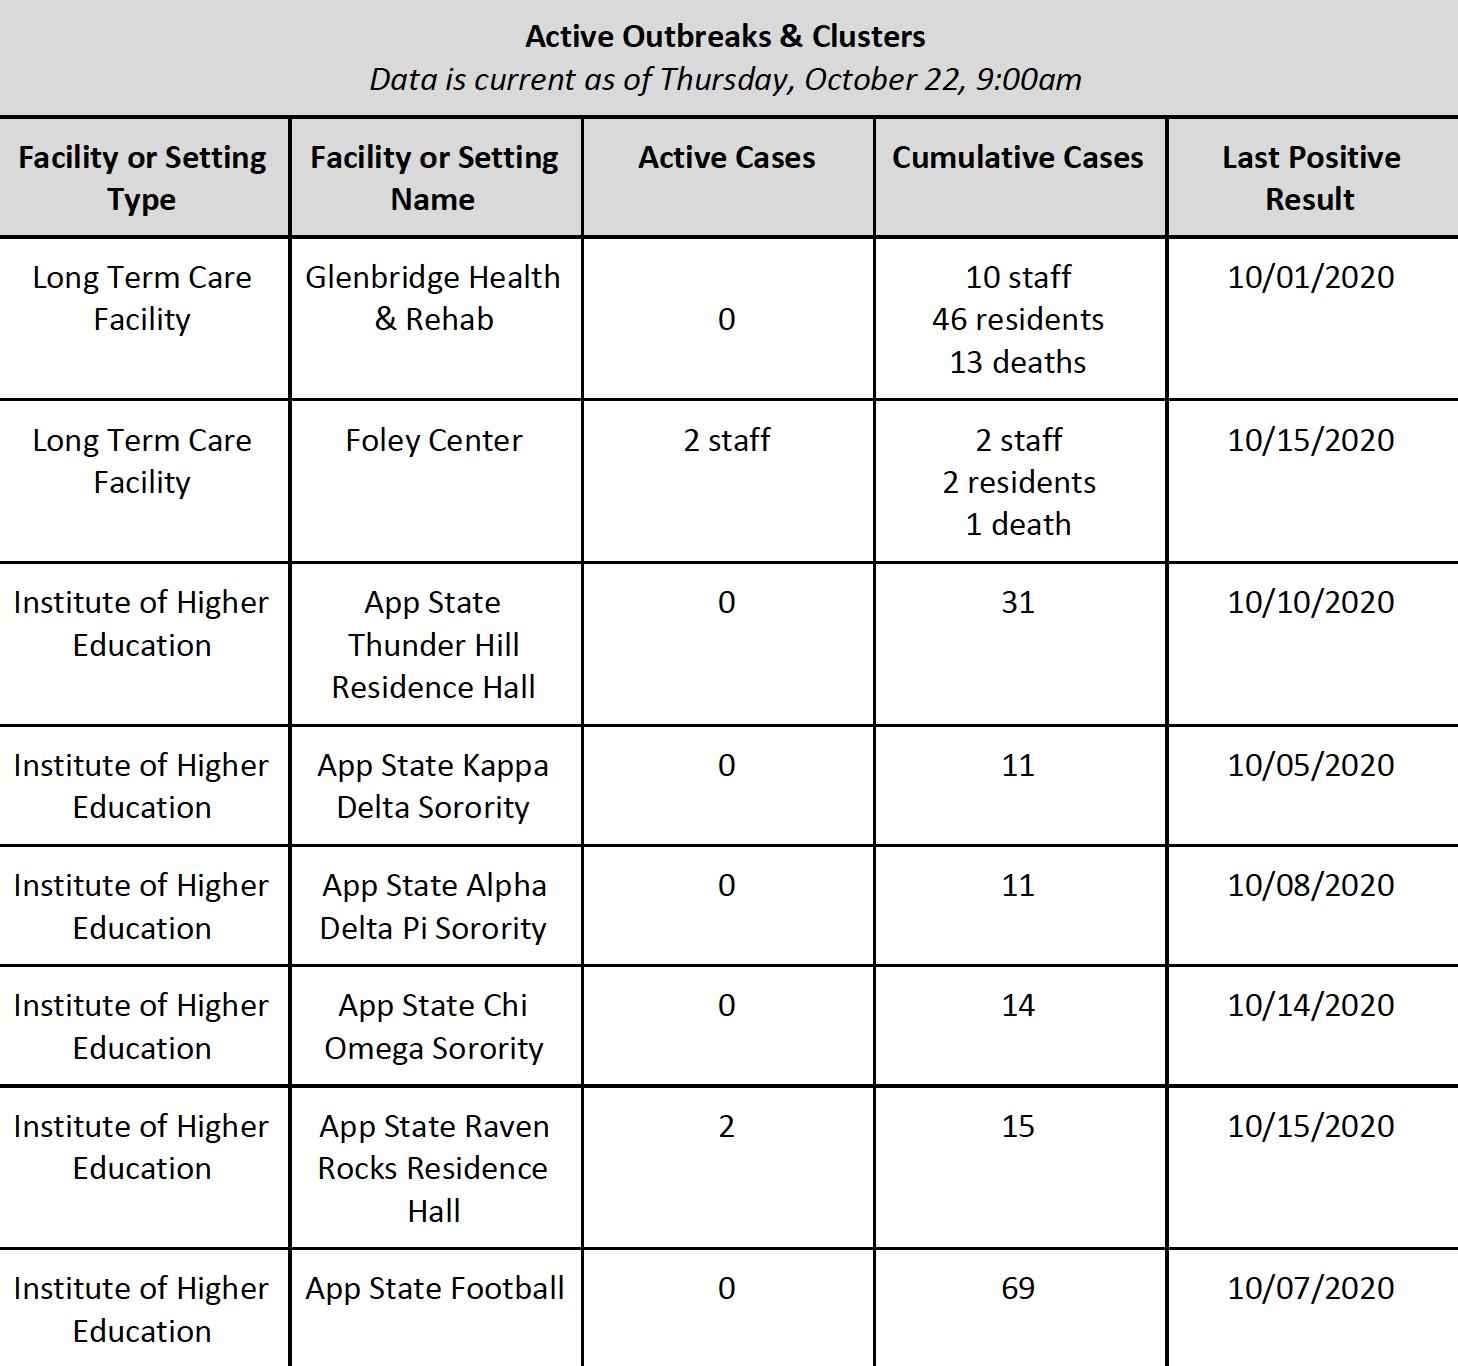 Monday October 26 -  Appalachian State, Watauga, Alleghany & Ashe COVID-19 Cases Data